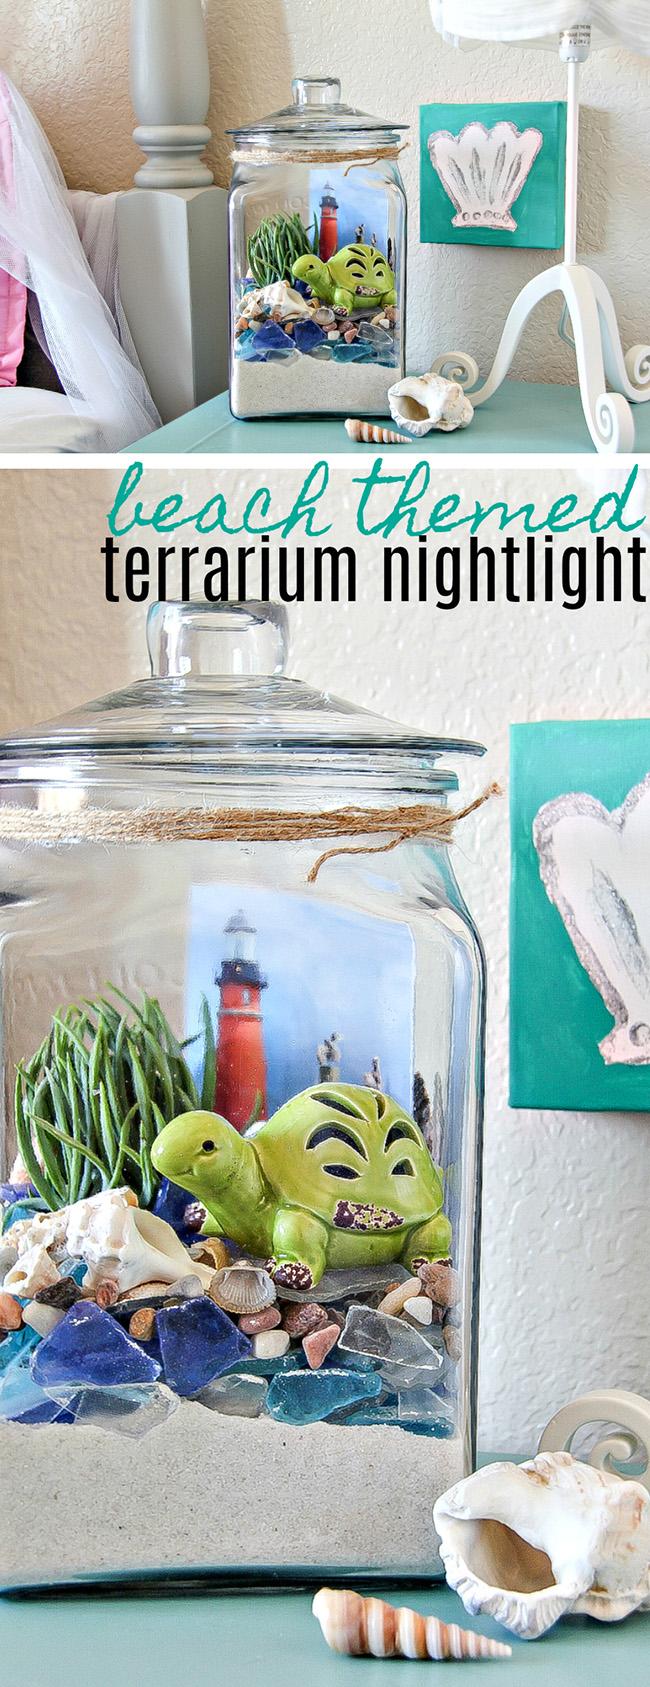 Beach Themed Terrarium Nightlight